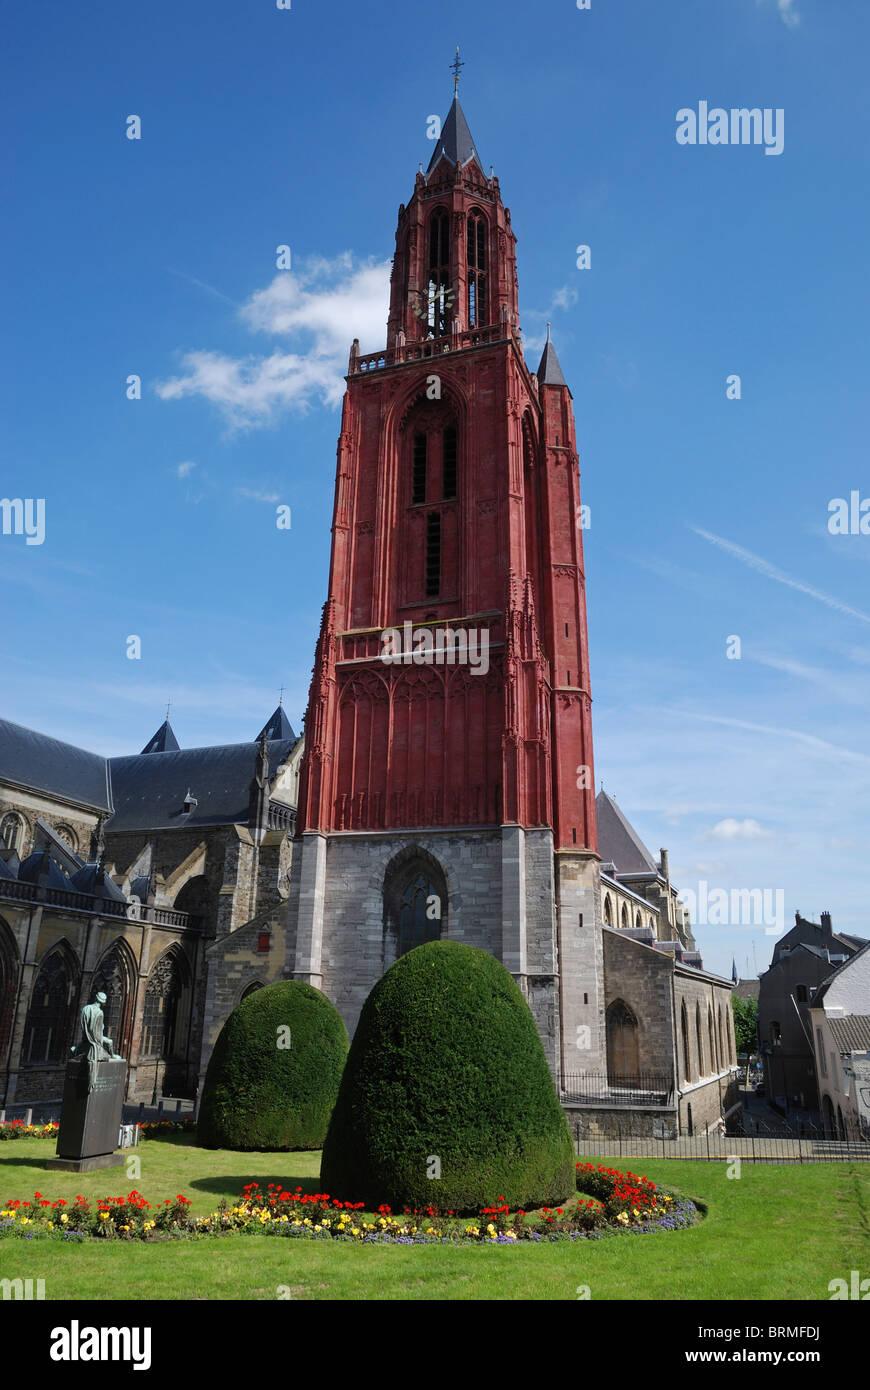 St janskerk maastricht limburg the netherlands stock - Maastricht mobel ...